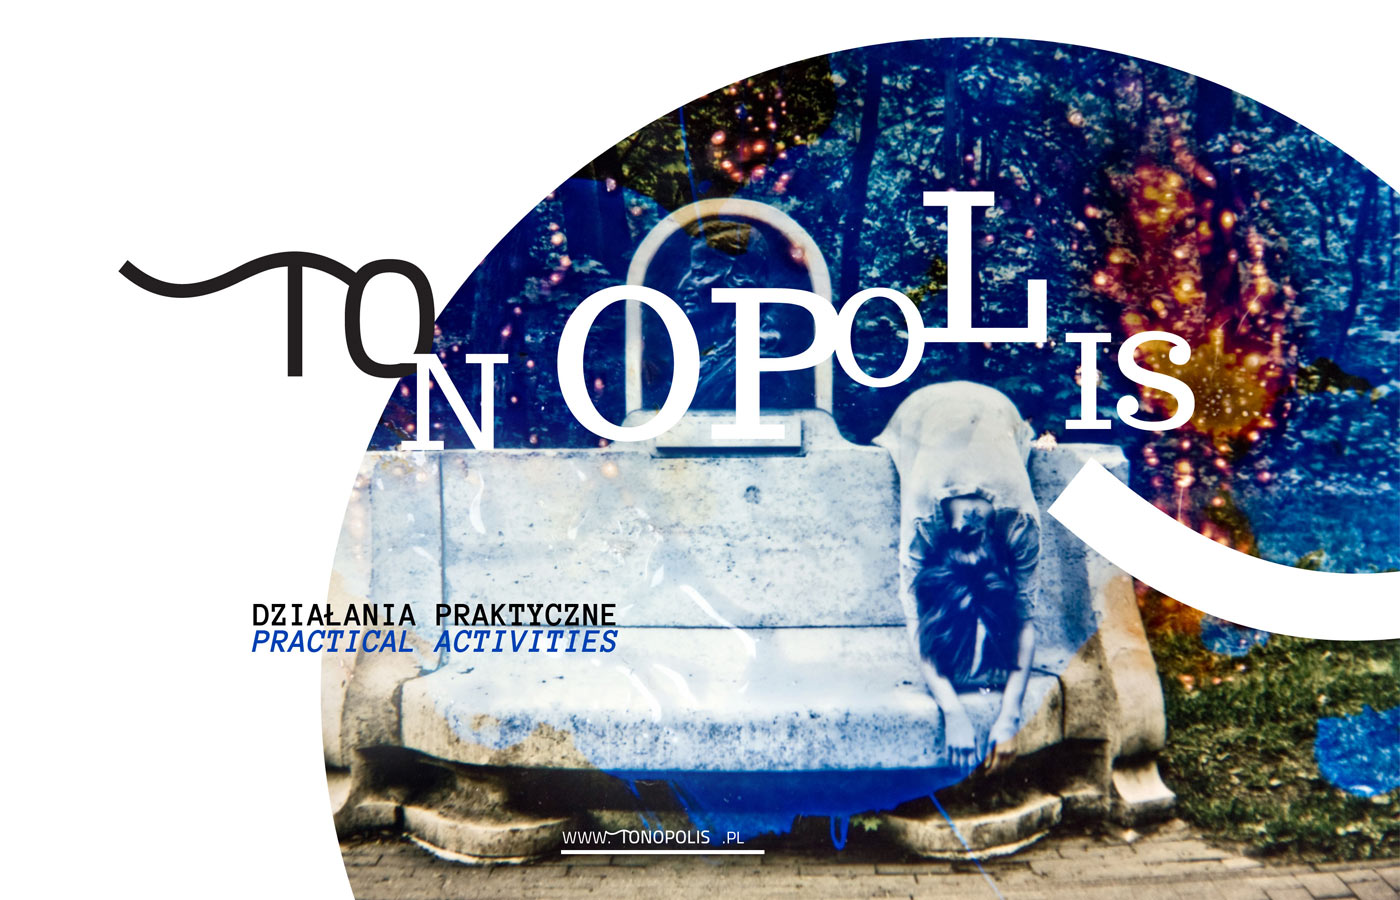 Tonopolis. Practical activities – exhibition